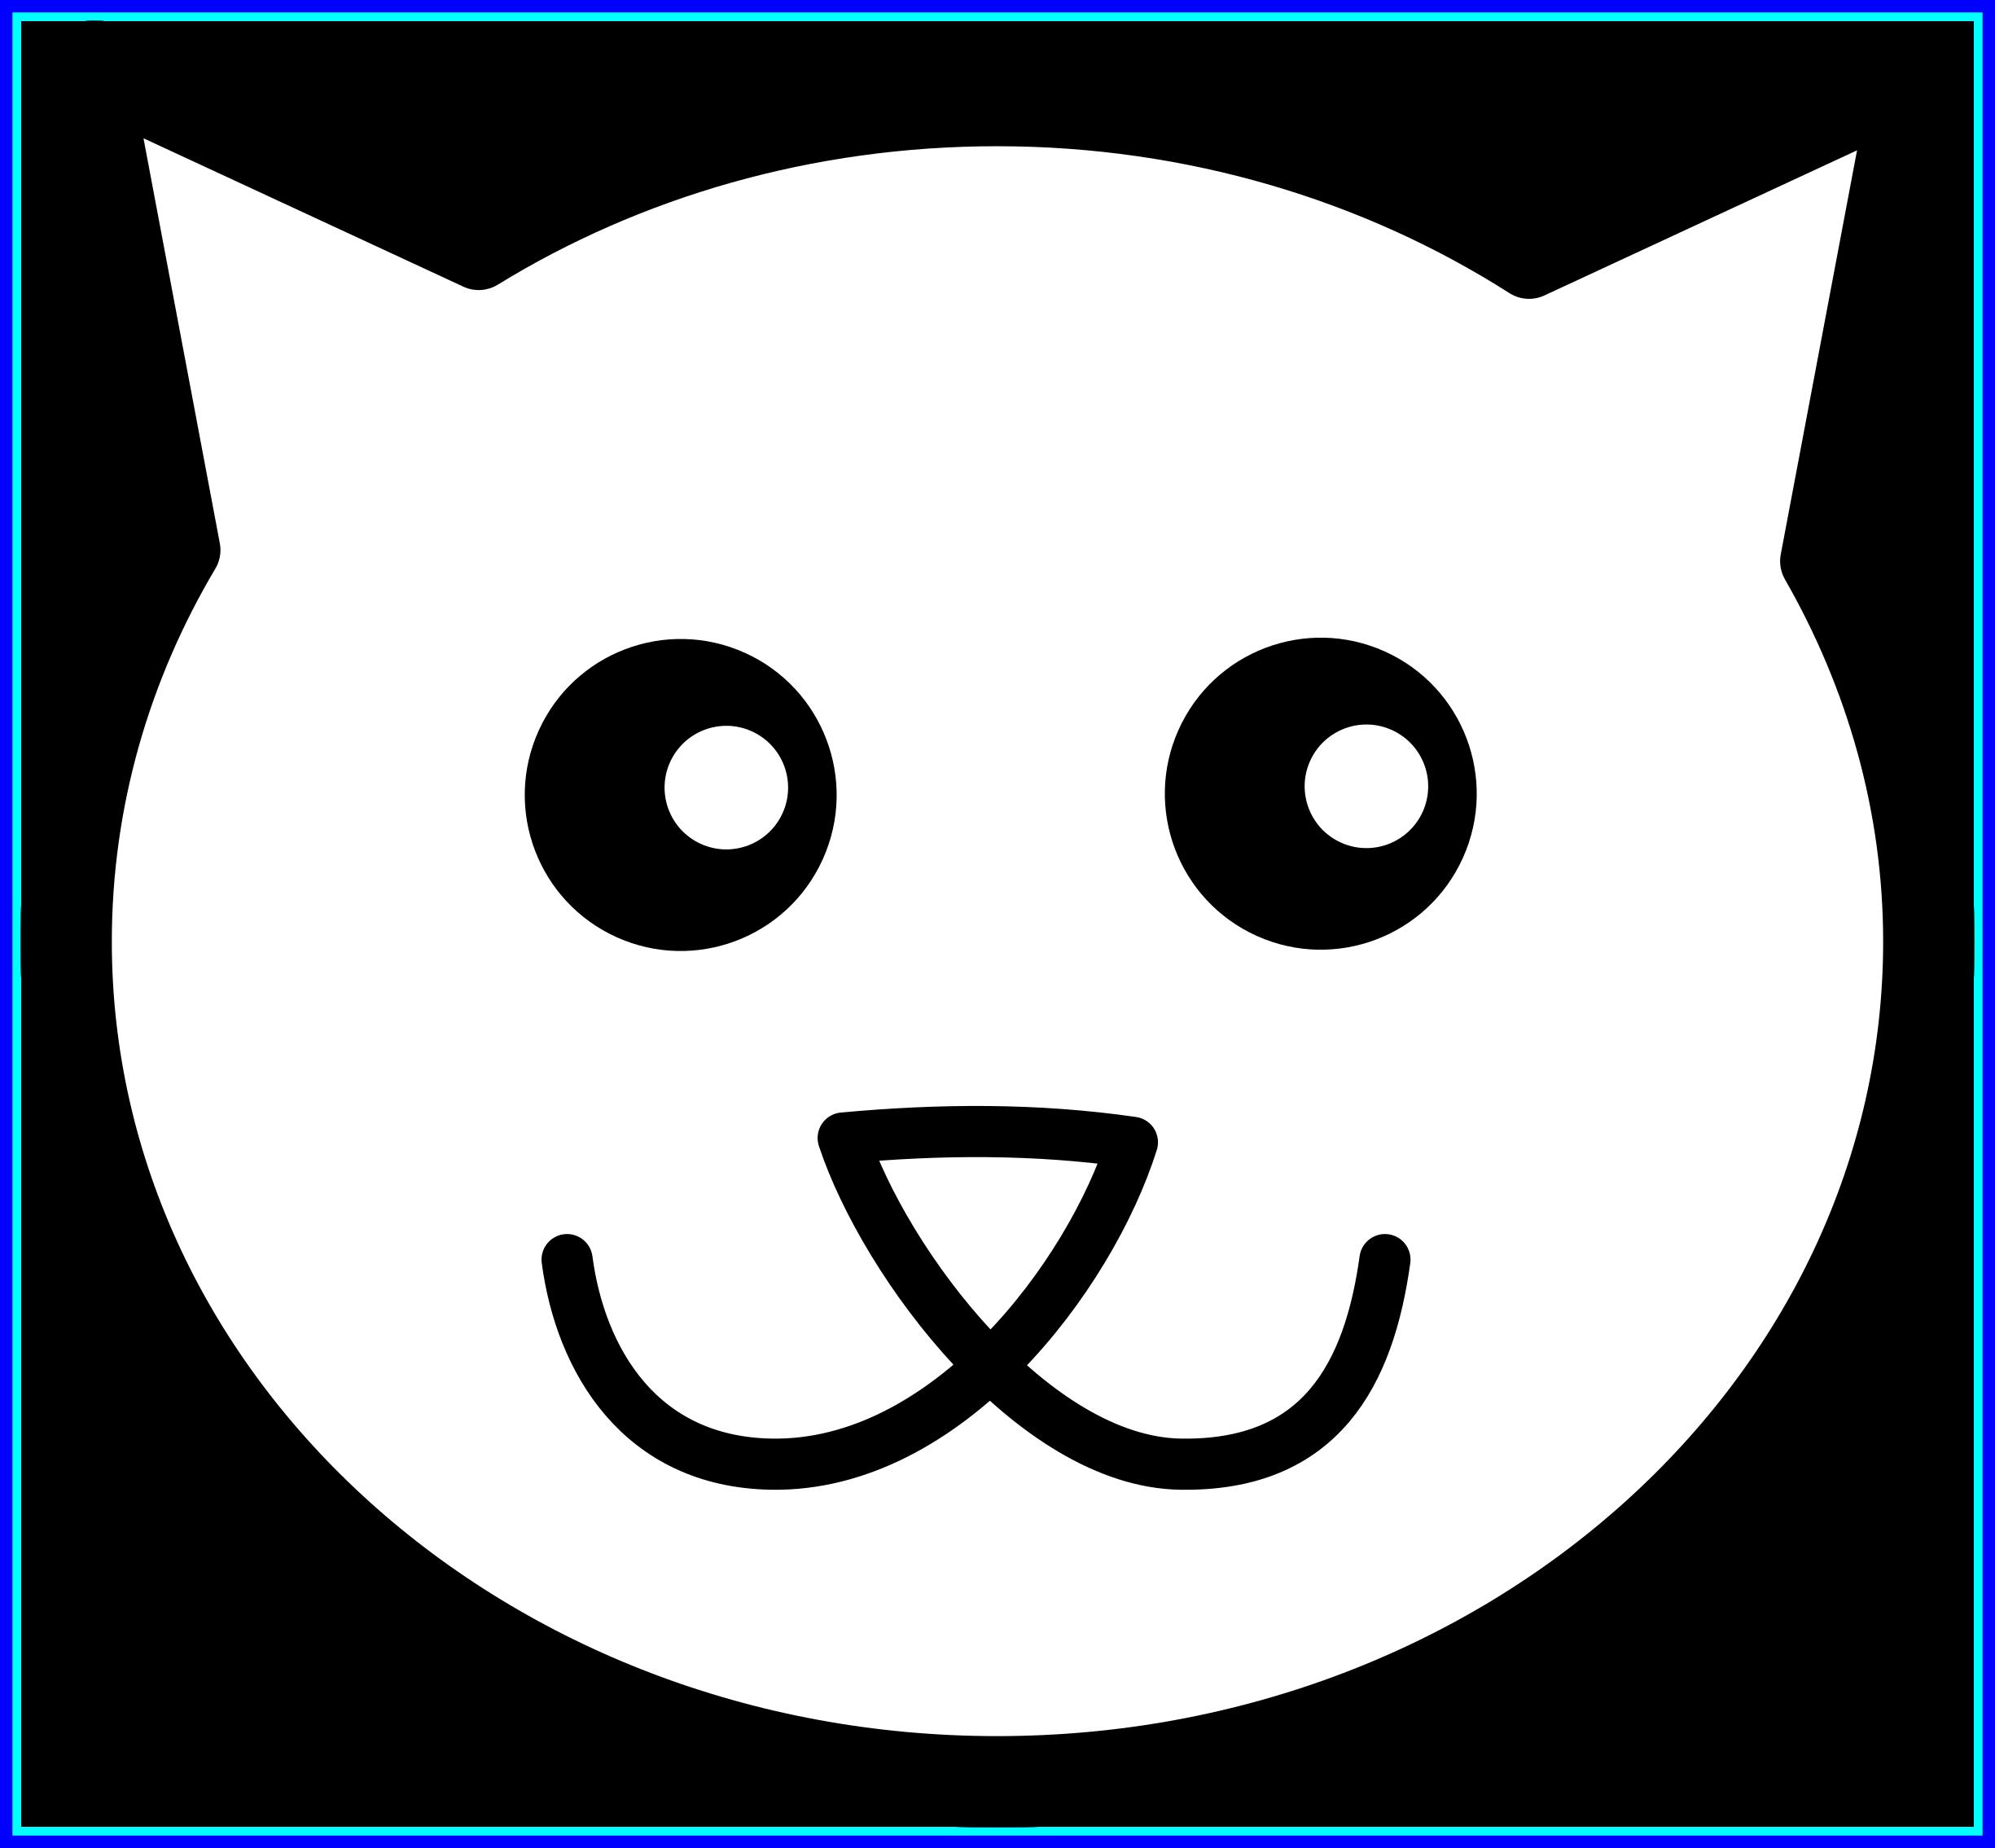 Kittens clipart black and white. Amazing best clip art